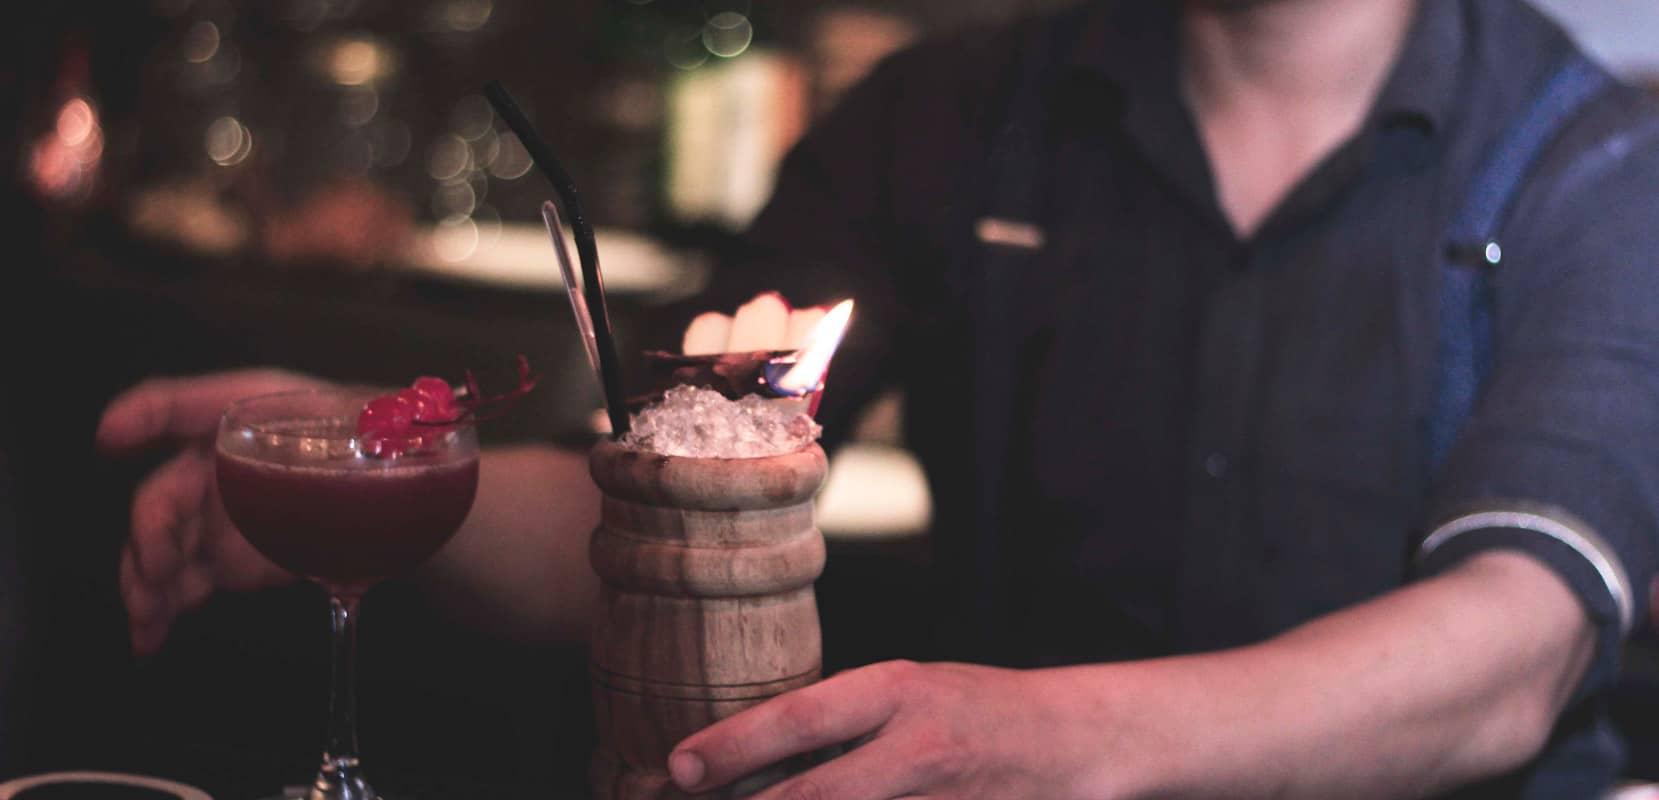 Cocktails and Dreams - Speakeasy, Sector 15, Gurugram | Get